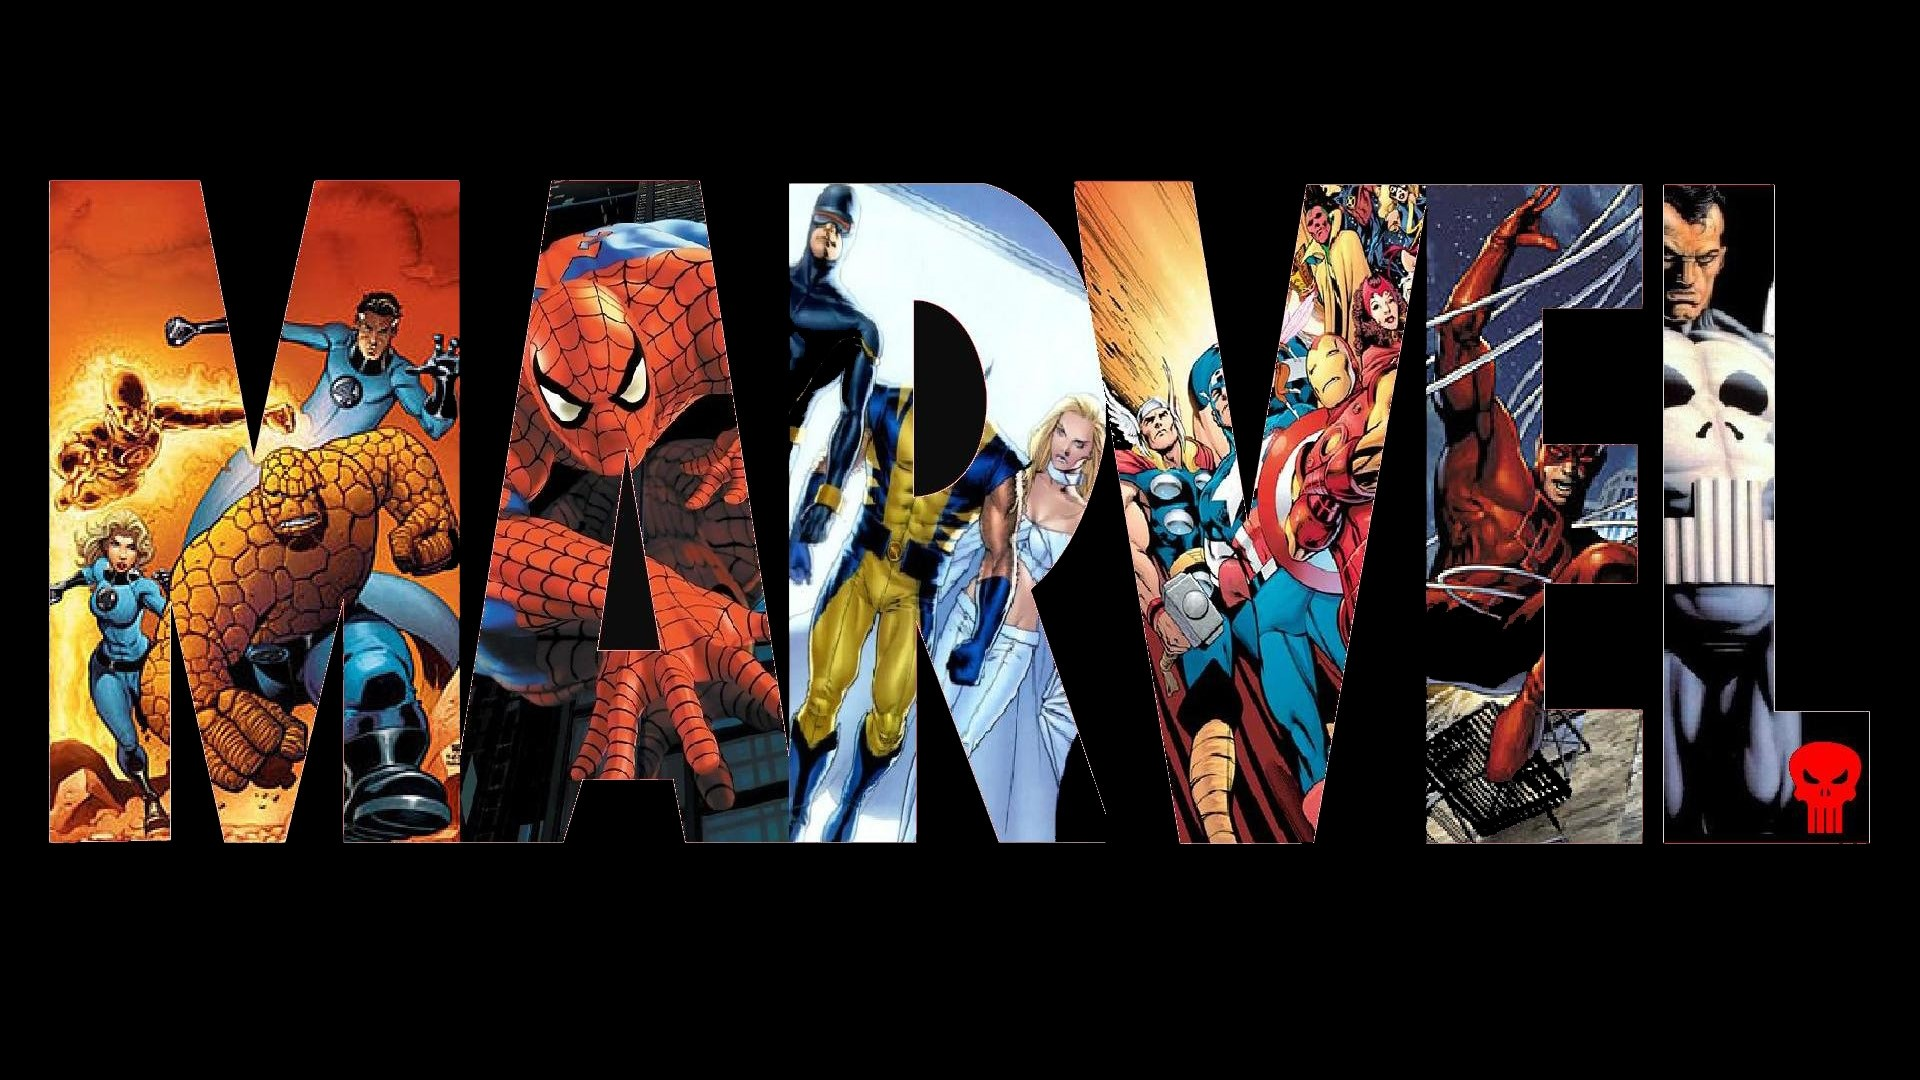 Best Wallpaper Marvel Halloween - 937606-widescreen-marvel-wallpaper-hd-1920x1080-for-iphone-7  Gallery_338411.jpg